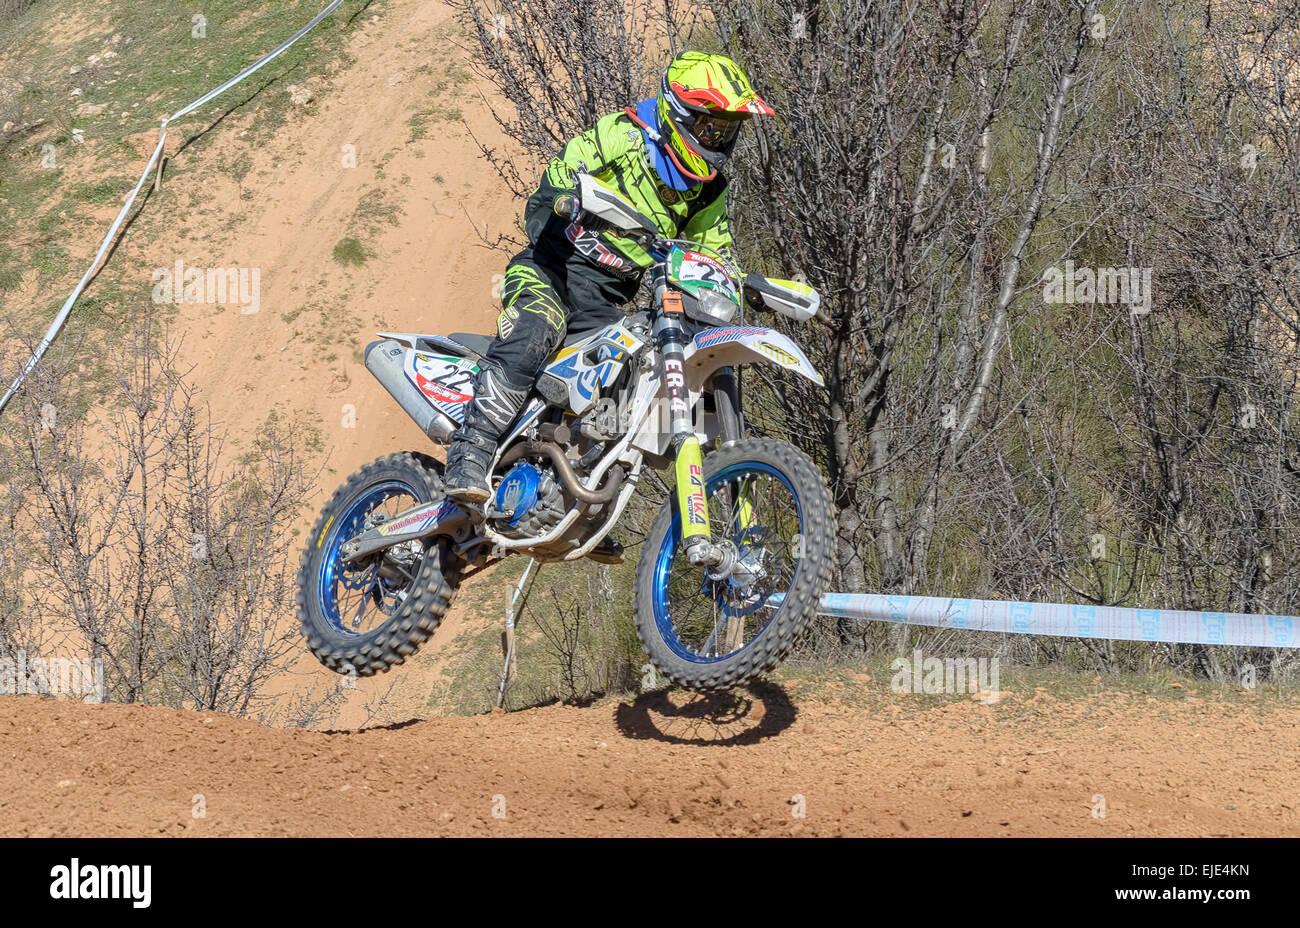 Spain cross country championship. Marcos Beraza Vitoria driving a Husqvarna motorcycle. - Stock Image